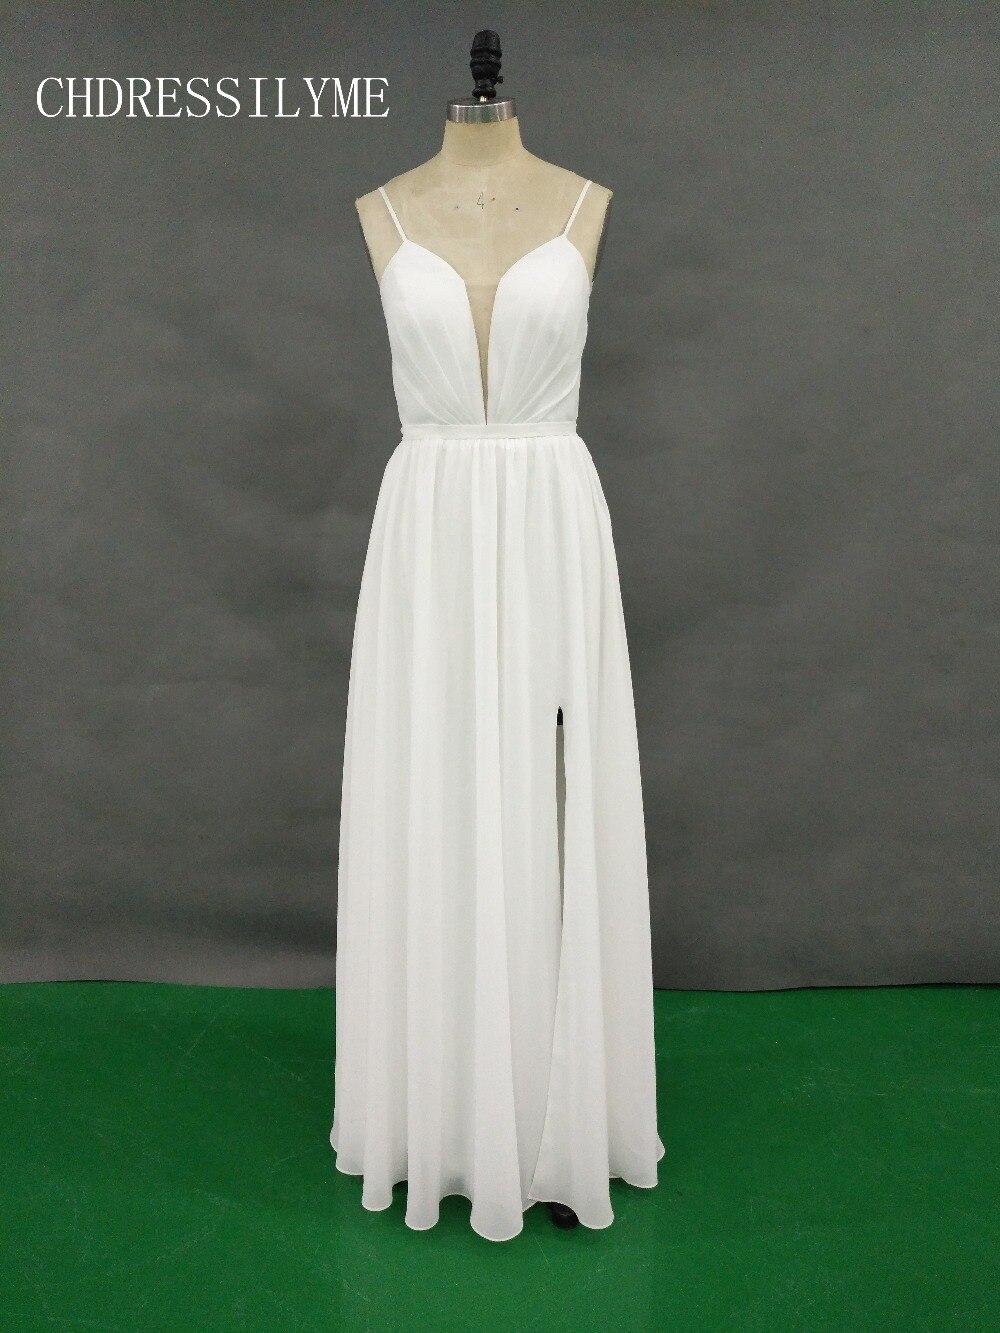 custome   Bridesmaid     Dresses   Spaghetti Strap Chiffon Ivory   dress   V-neck Sexy